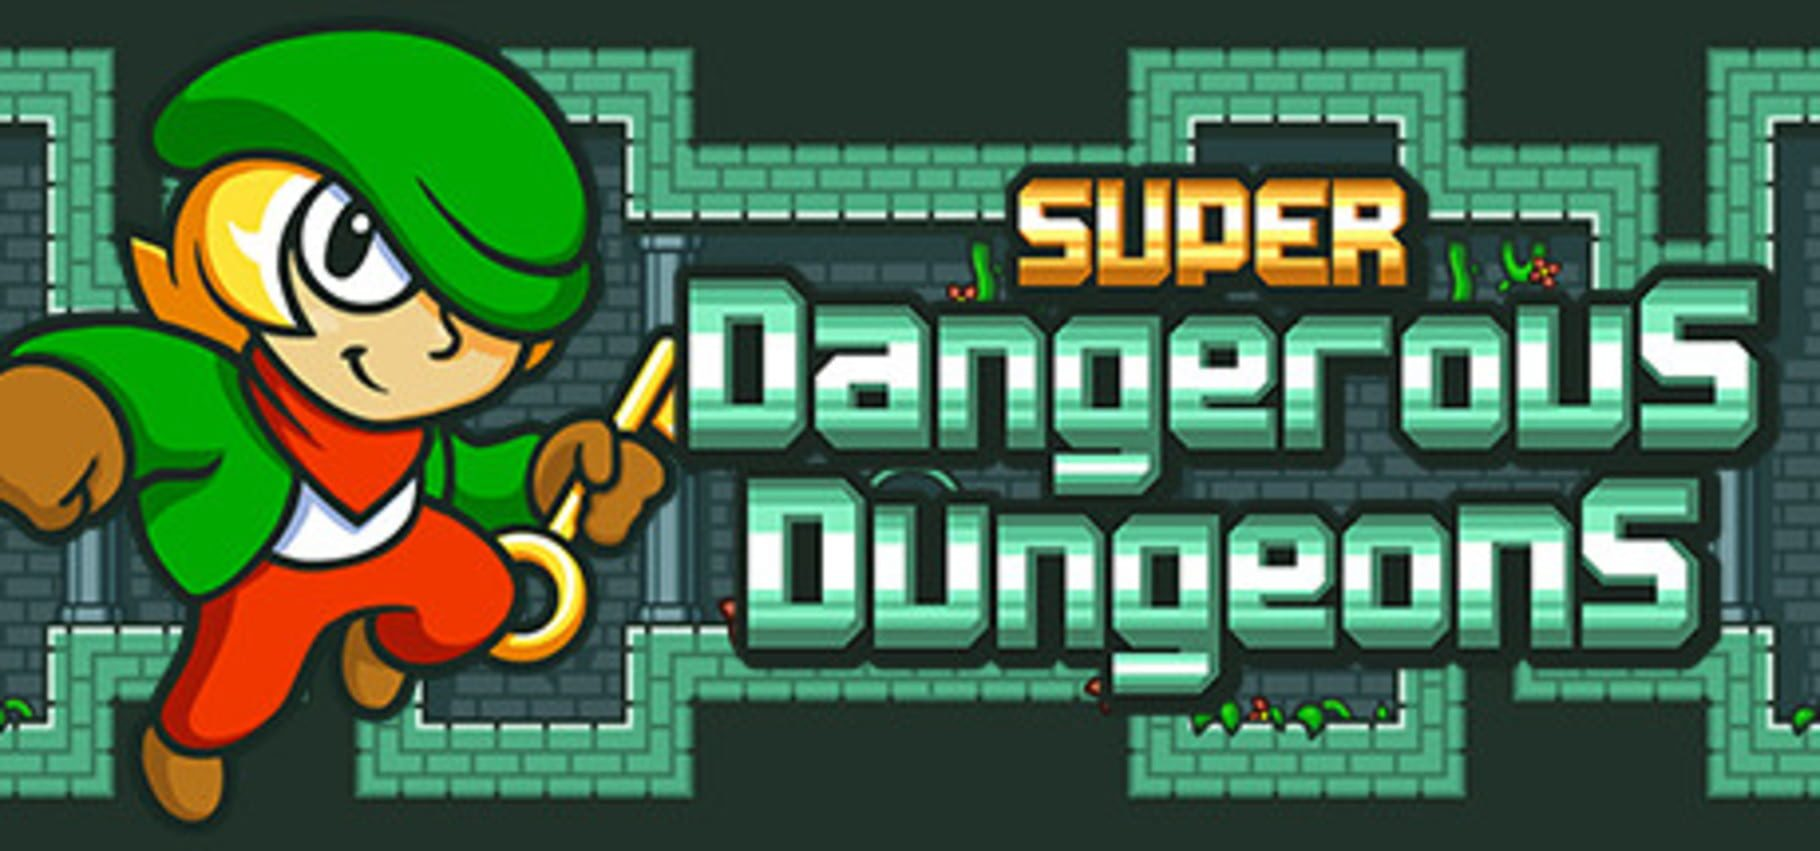 buy Super Dangerous Dungeons cd key for all platform